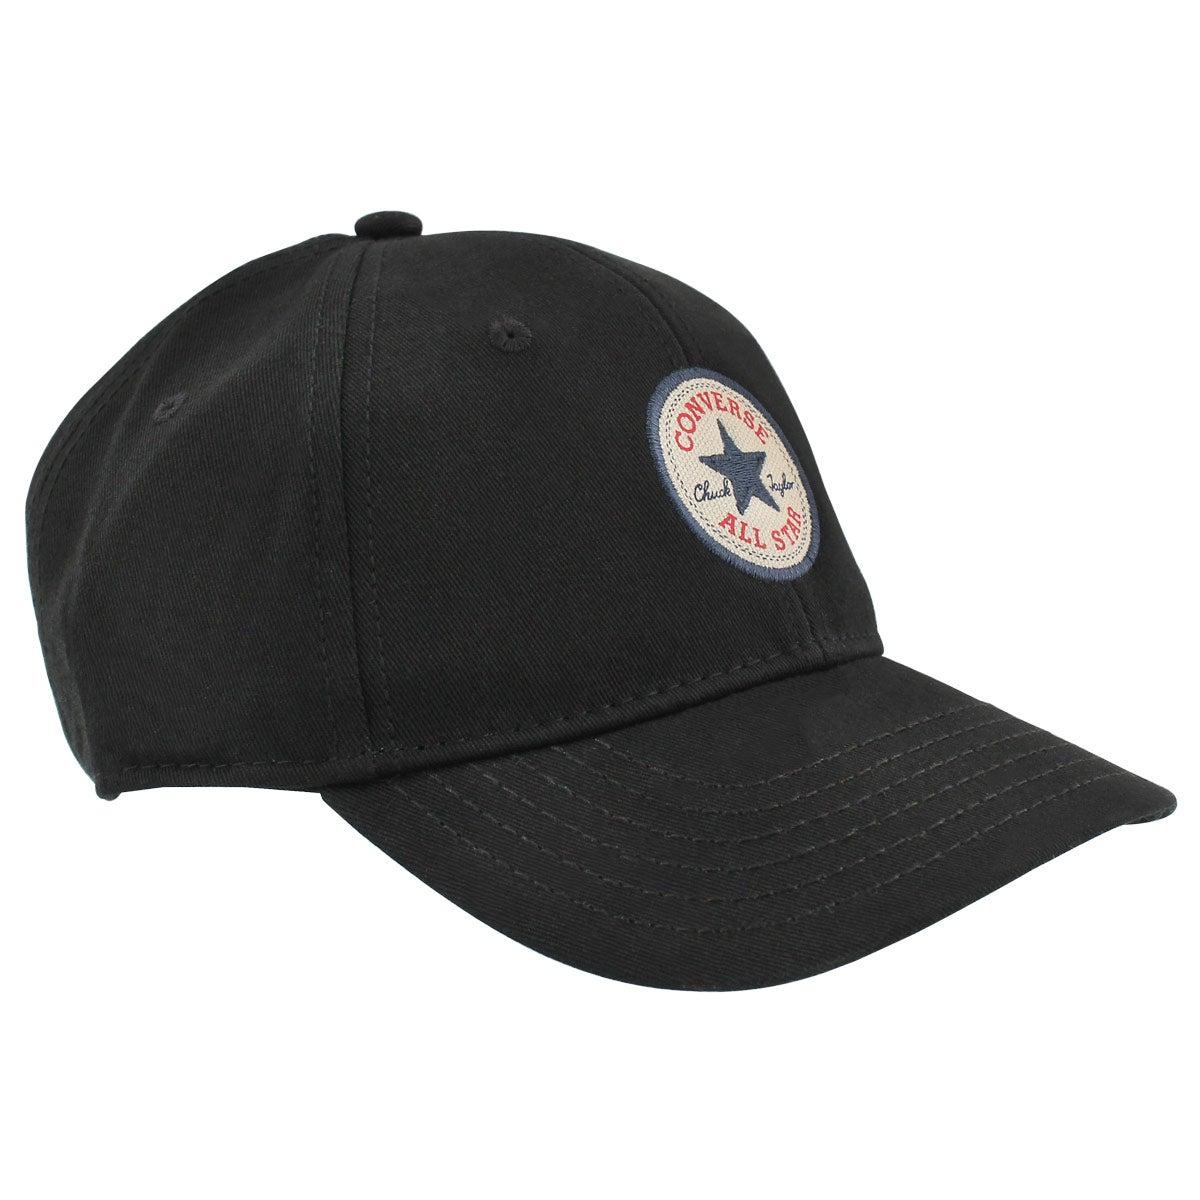 Lds Core black adjustable precurve cap